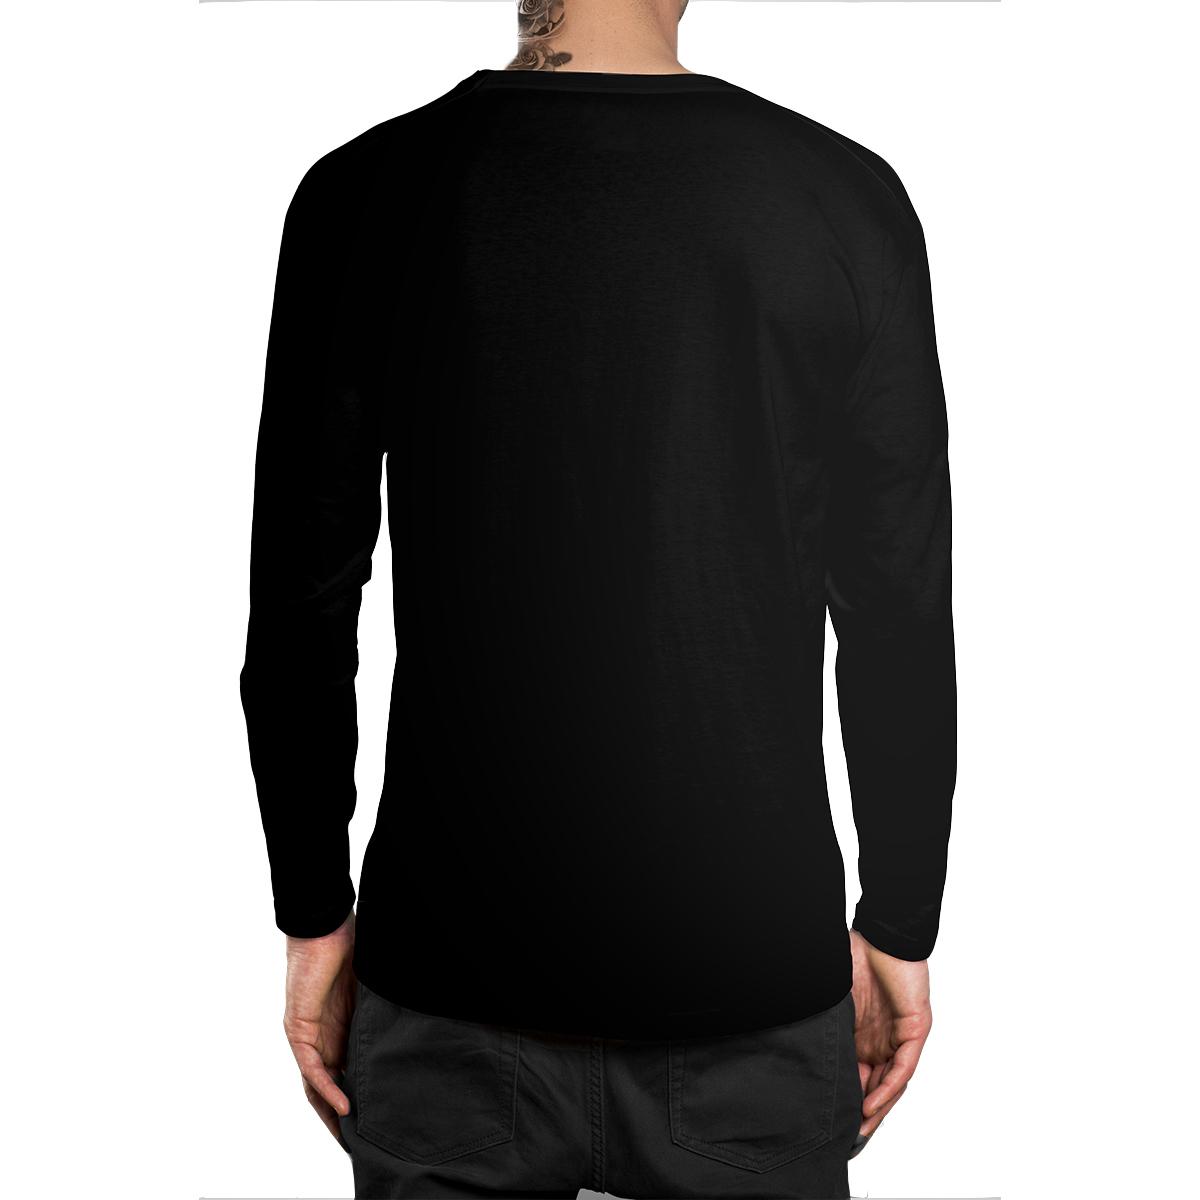 Stompy Camiseta Manga Longa Modelo 36